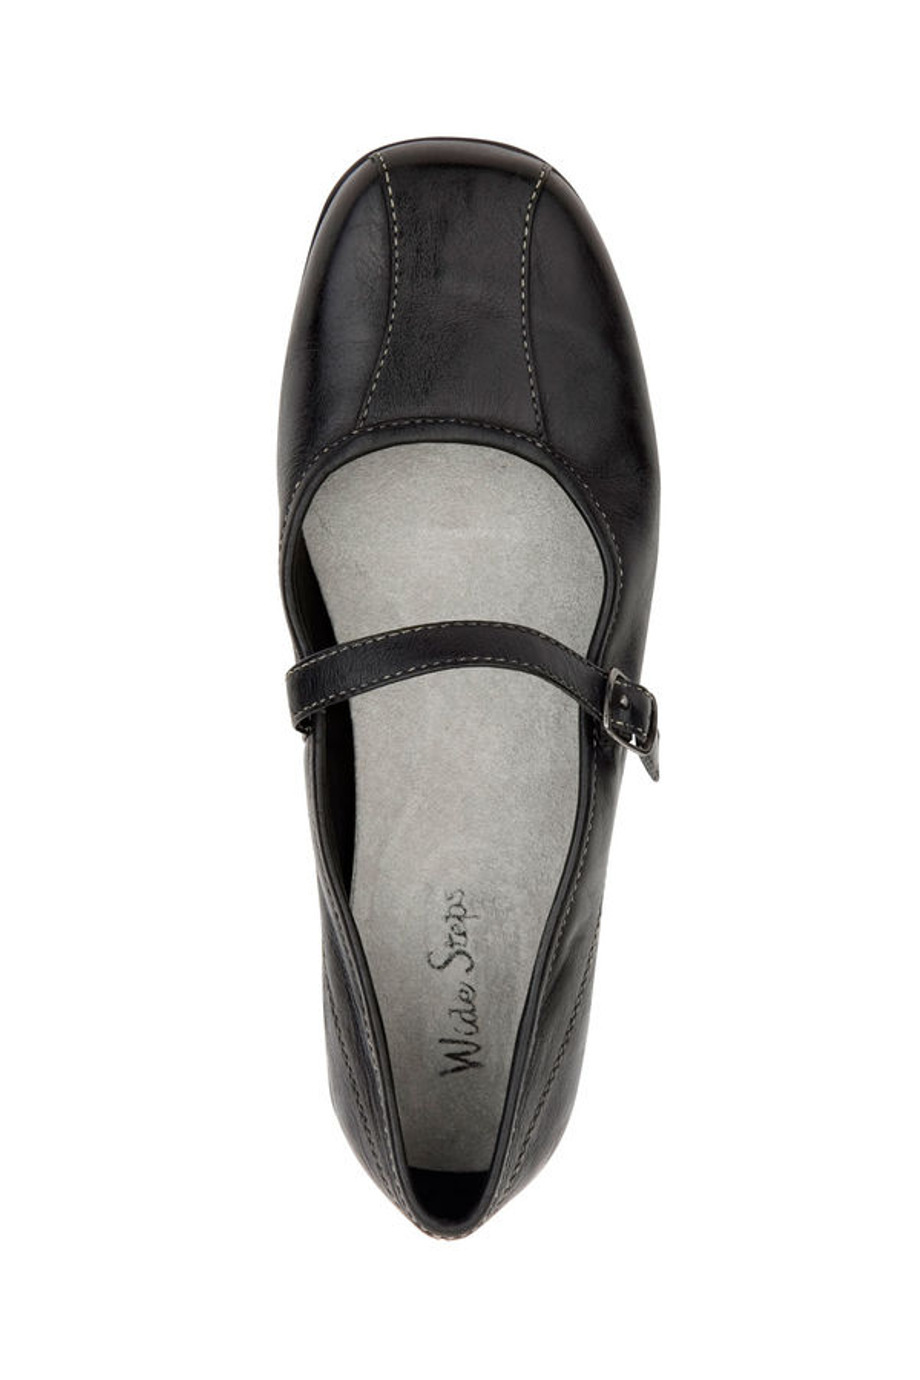 Planet Shoes Gabi Black Pump